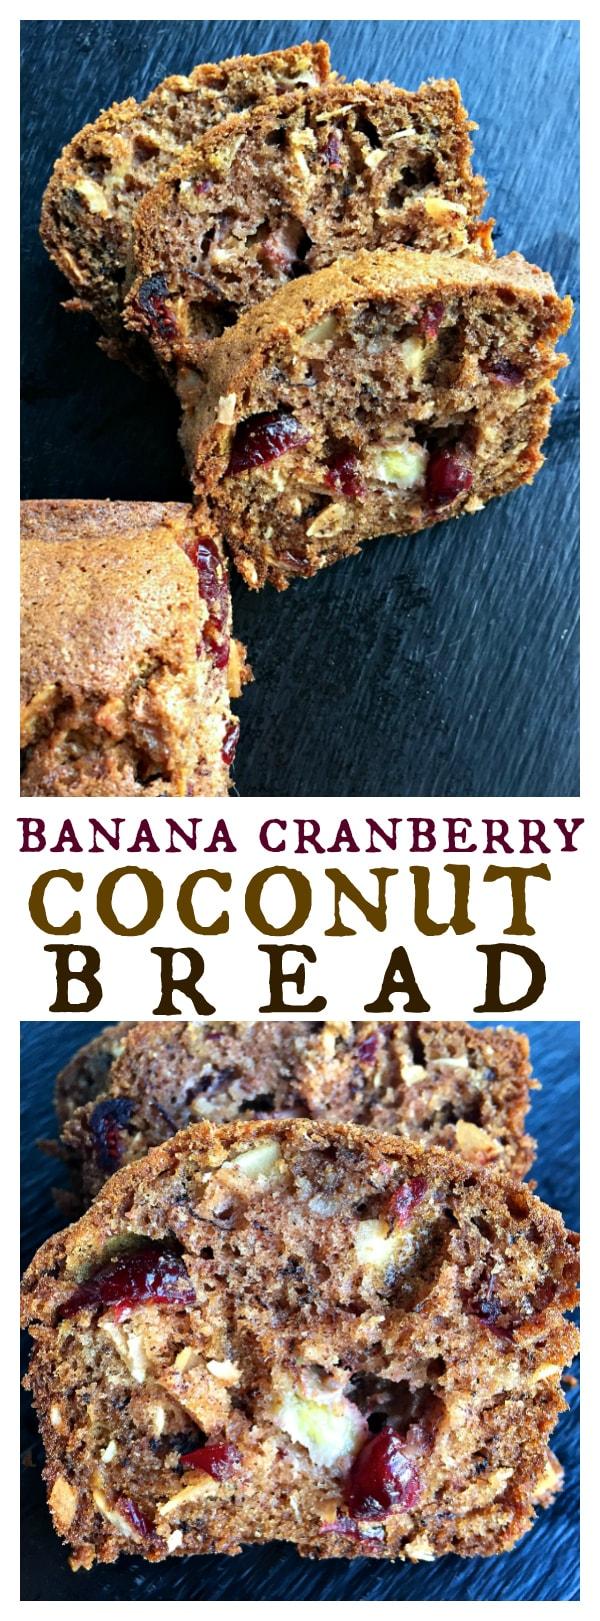 Banana Cranberry Coconut Bread